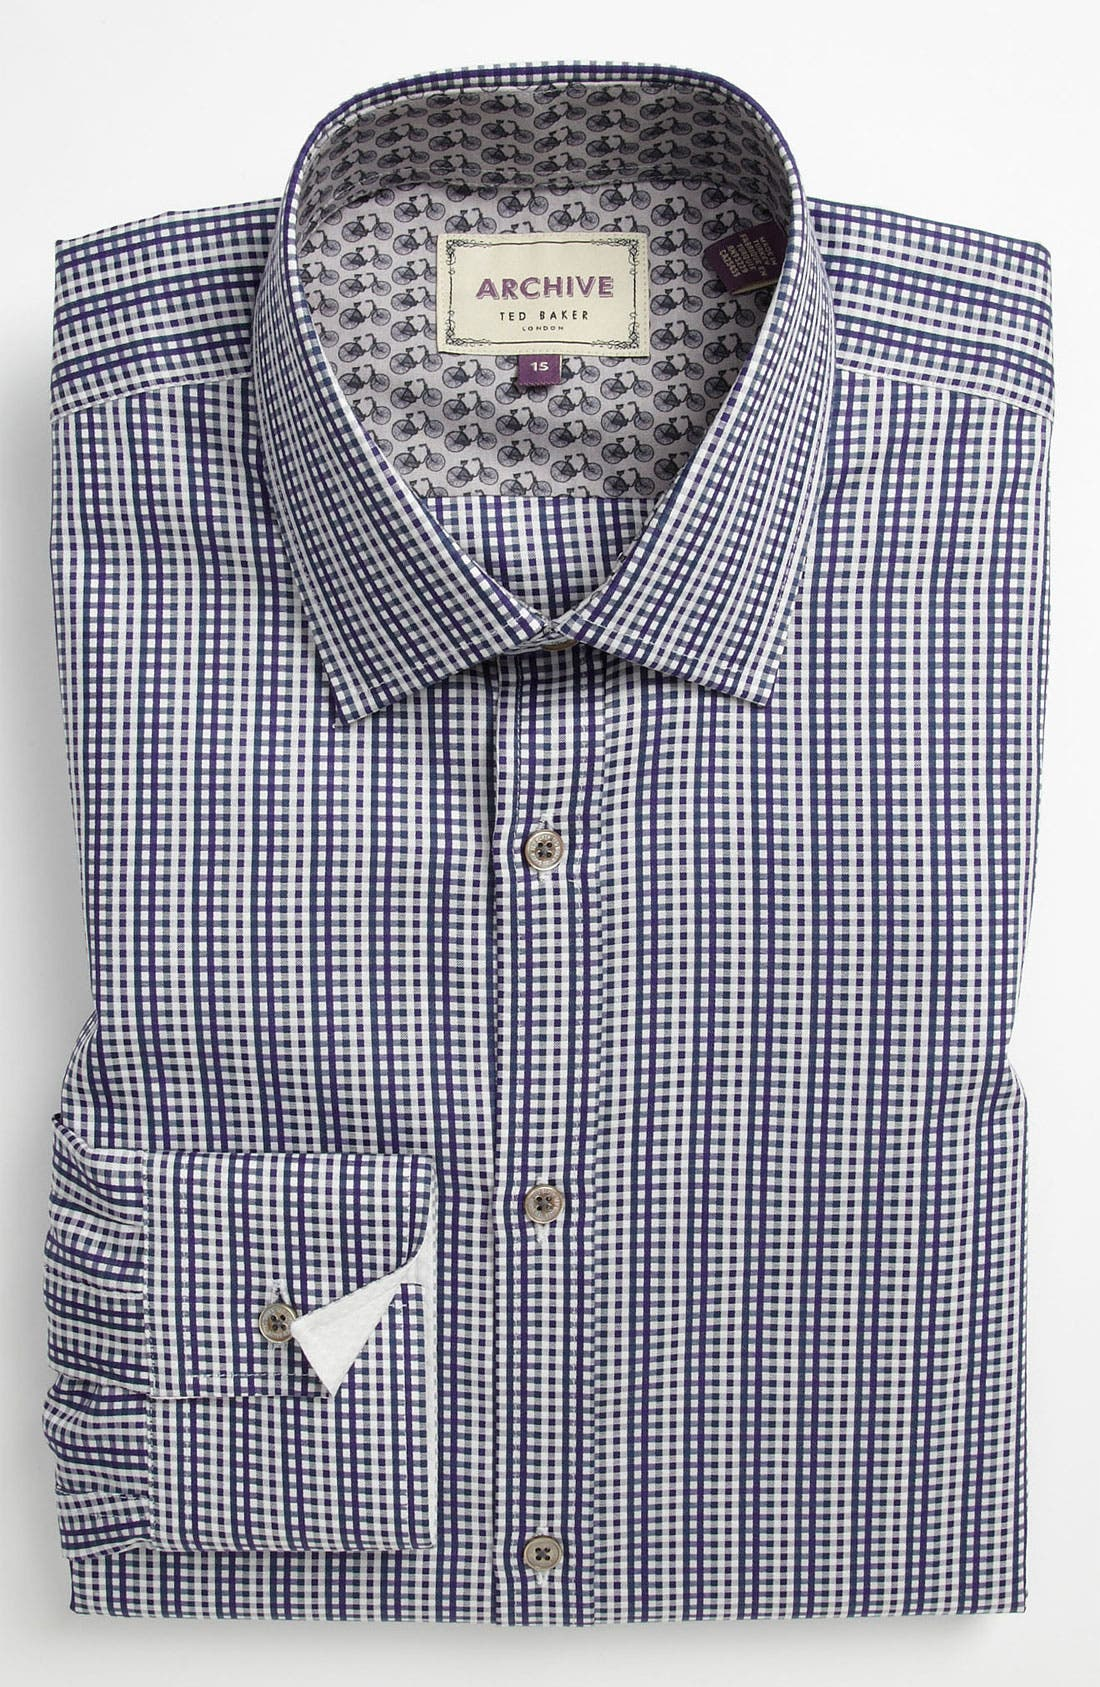 Alternate Image 1 Selected - Ted Baker London Trim Fit Dress Shirt